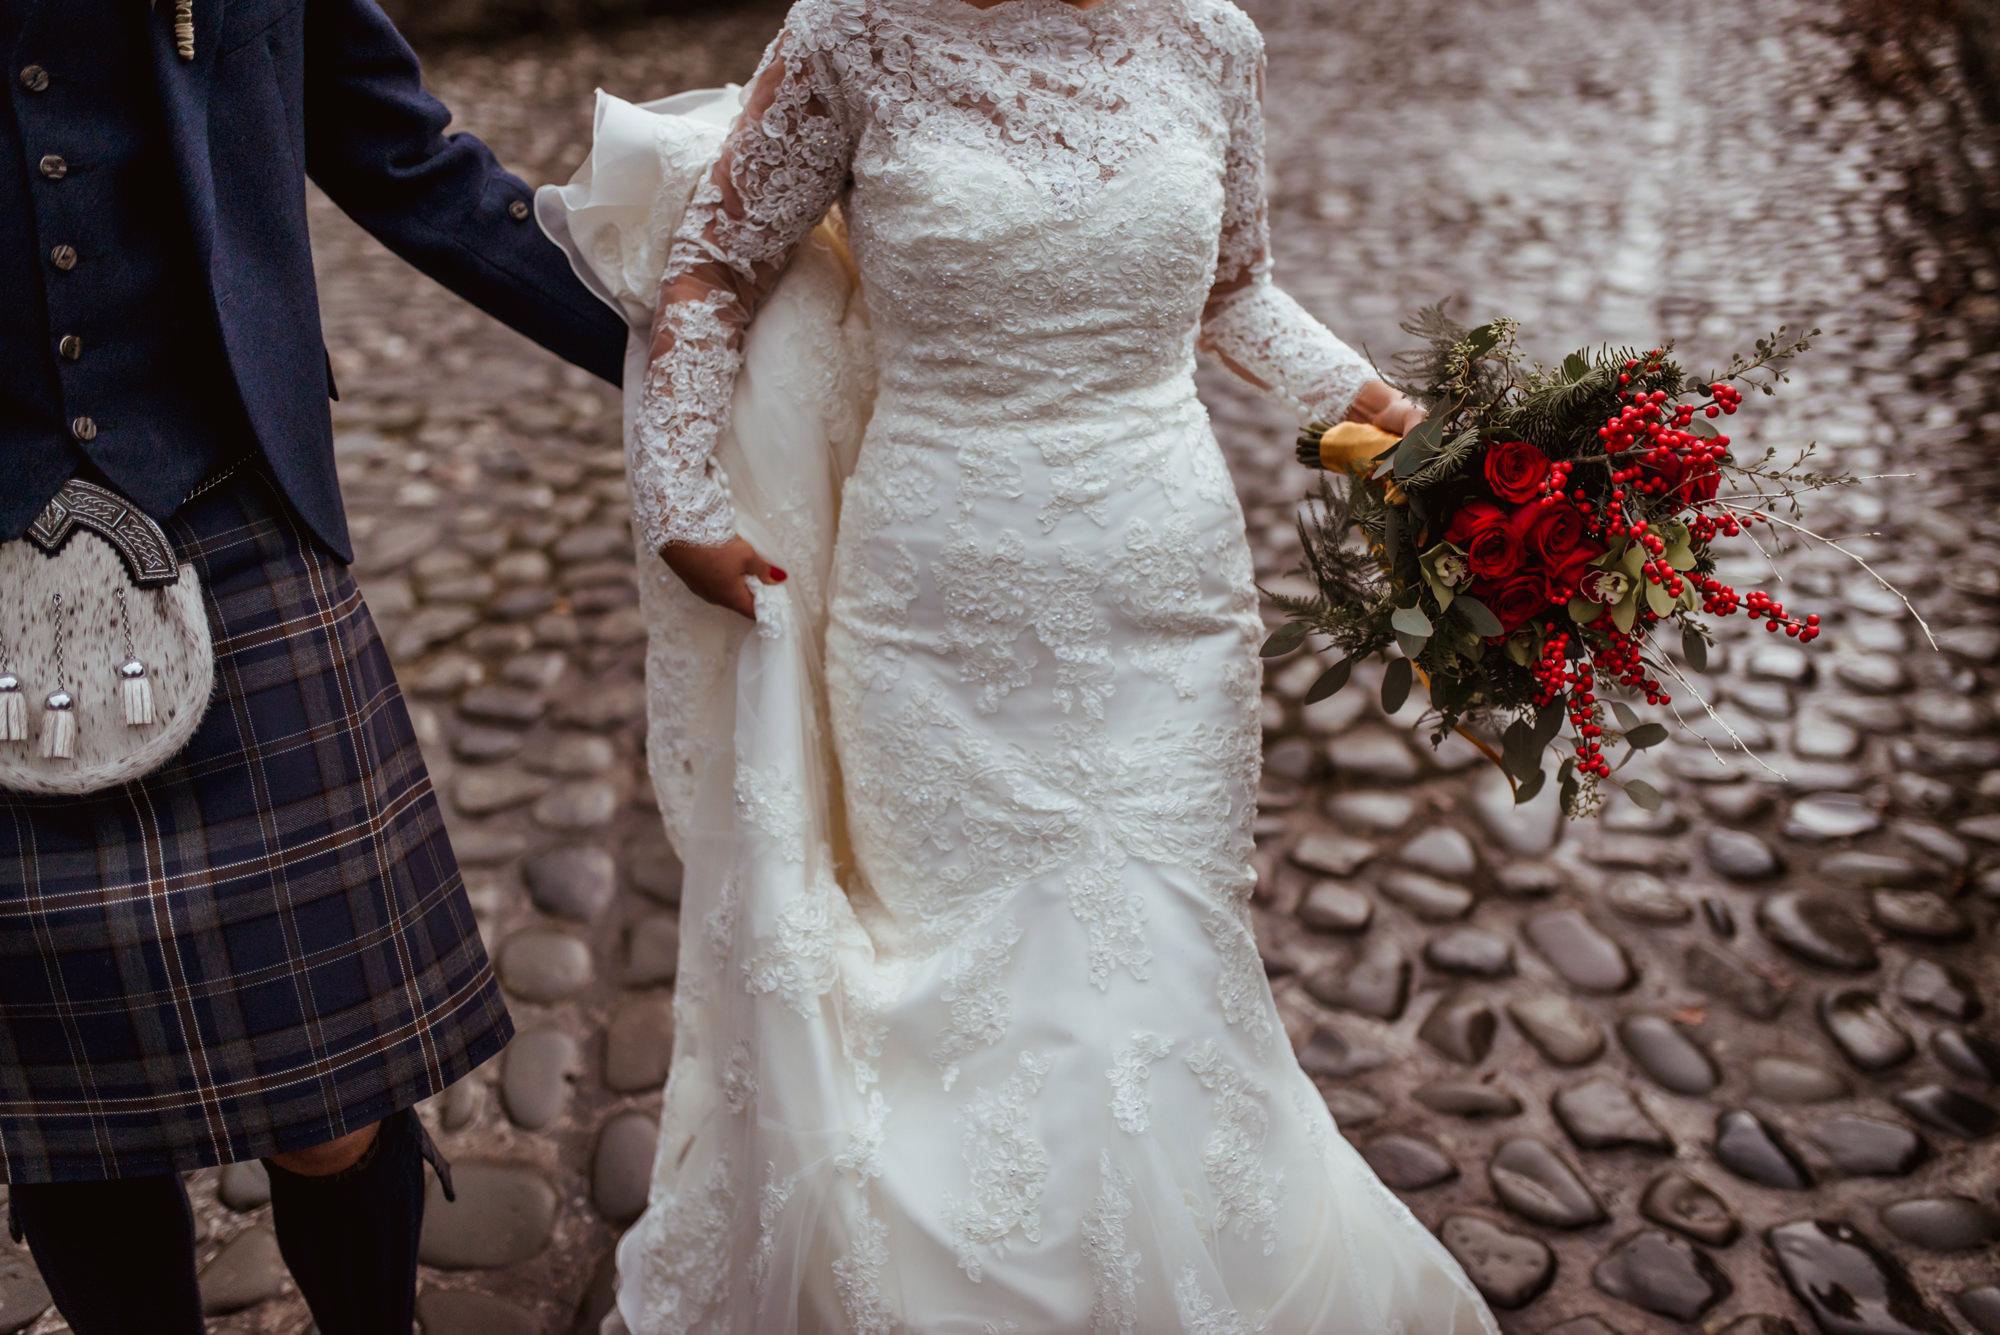 brig-o-doon-winter-wedding.jpg